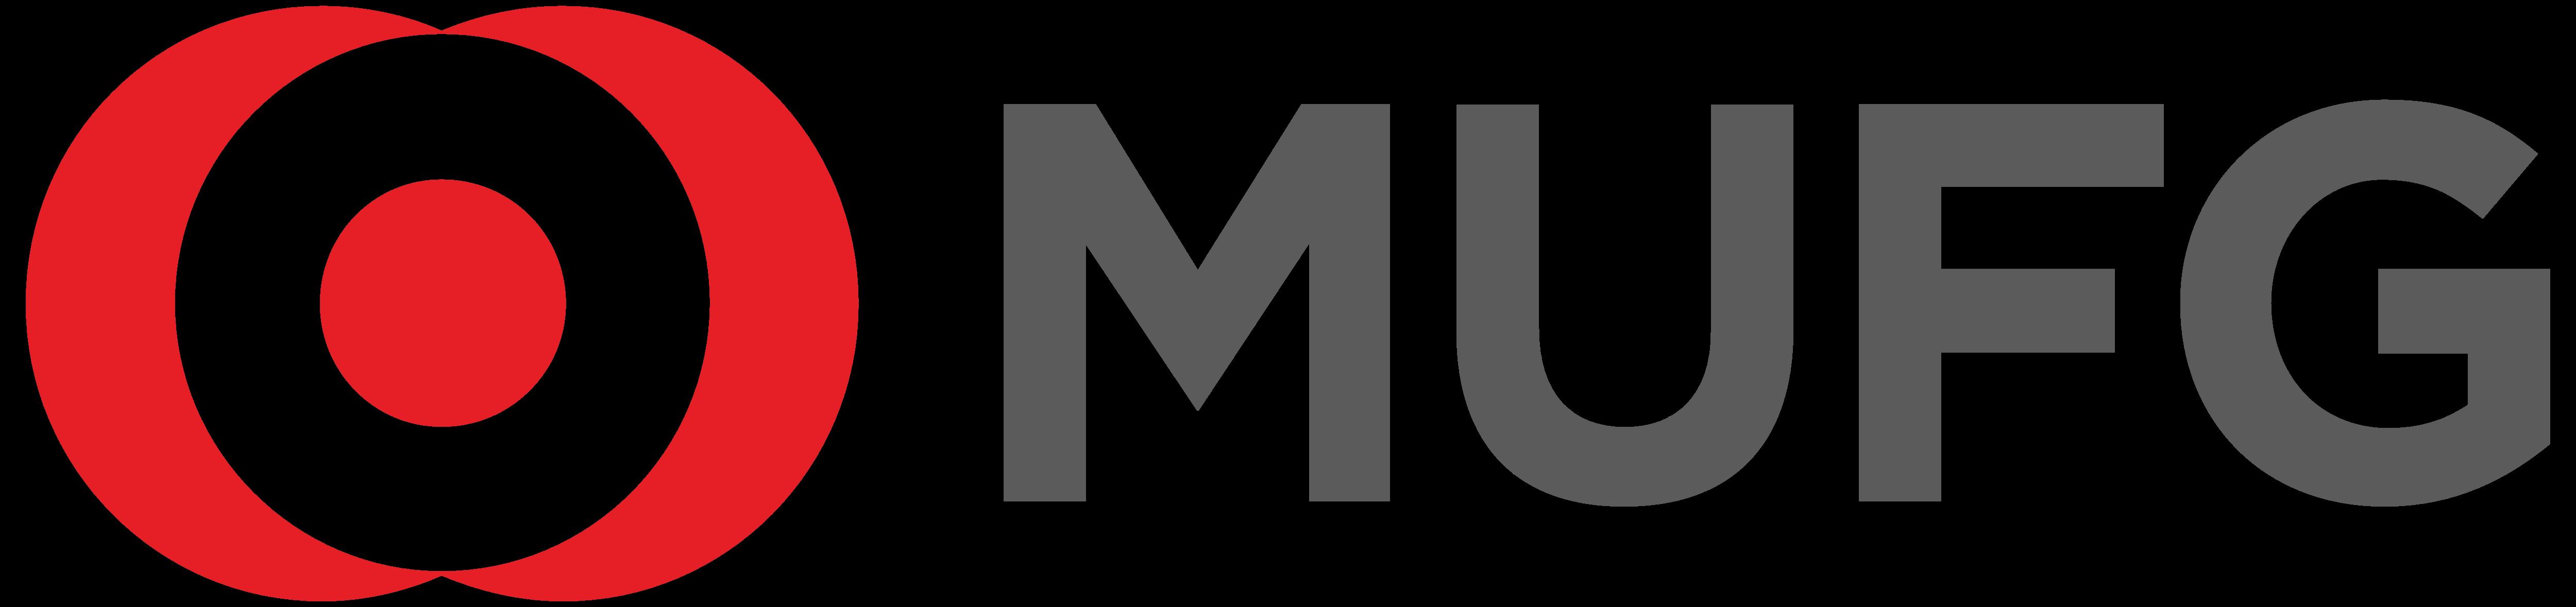 MUFG_logo_Mitsubishi_UFJ_Financial_Group